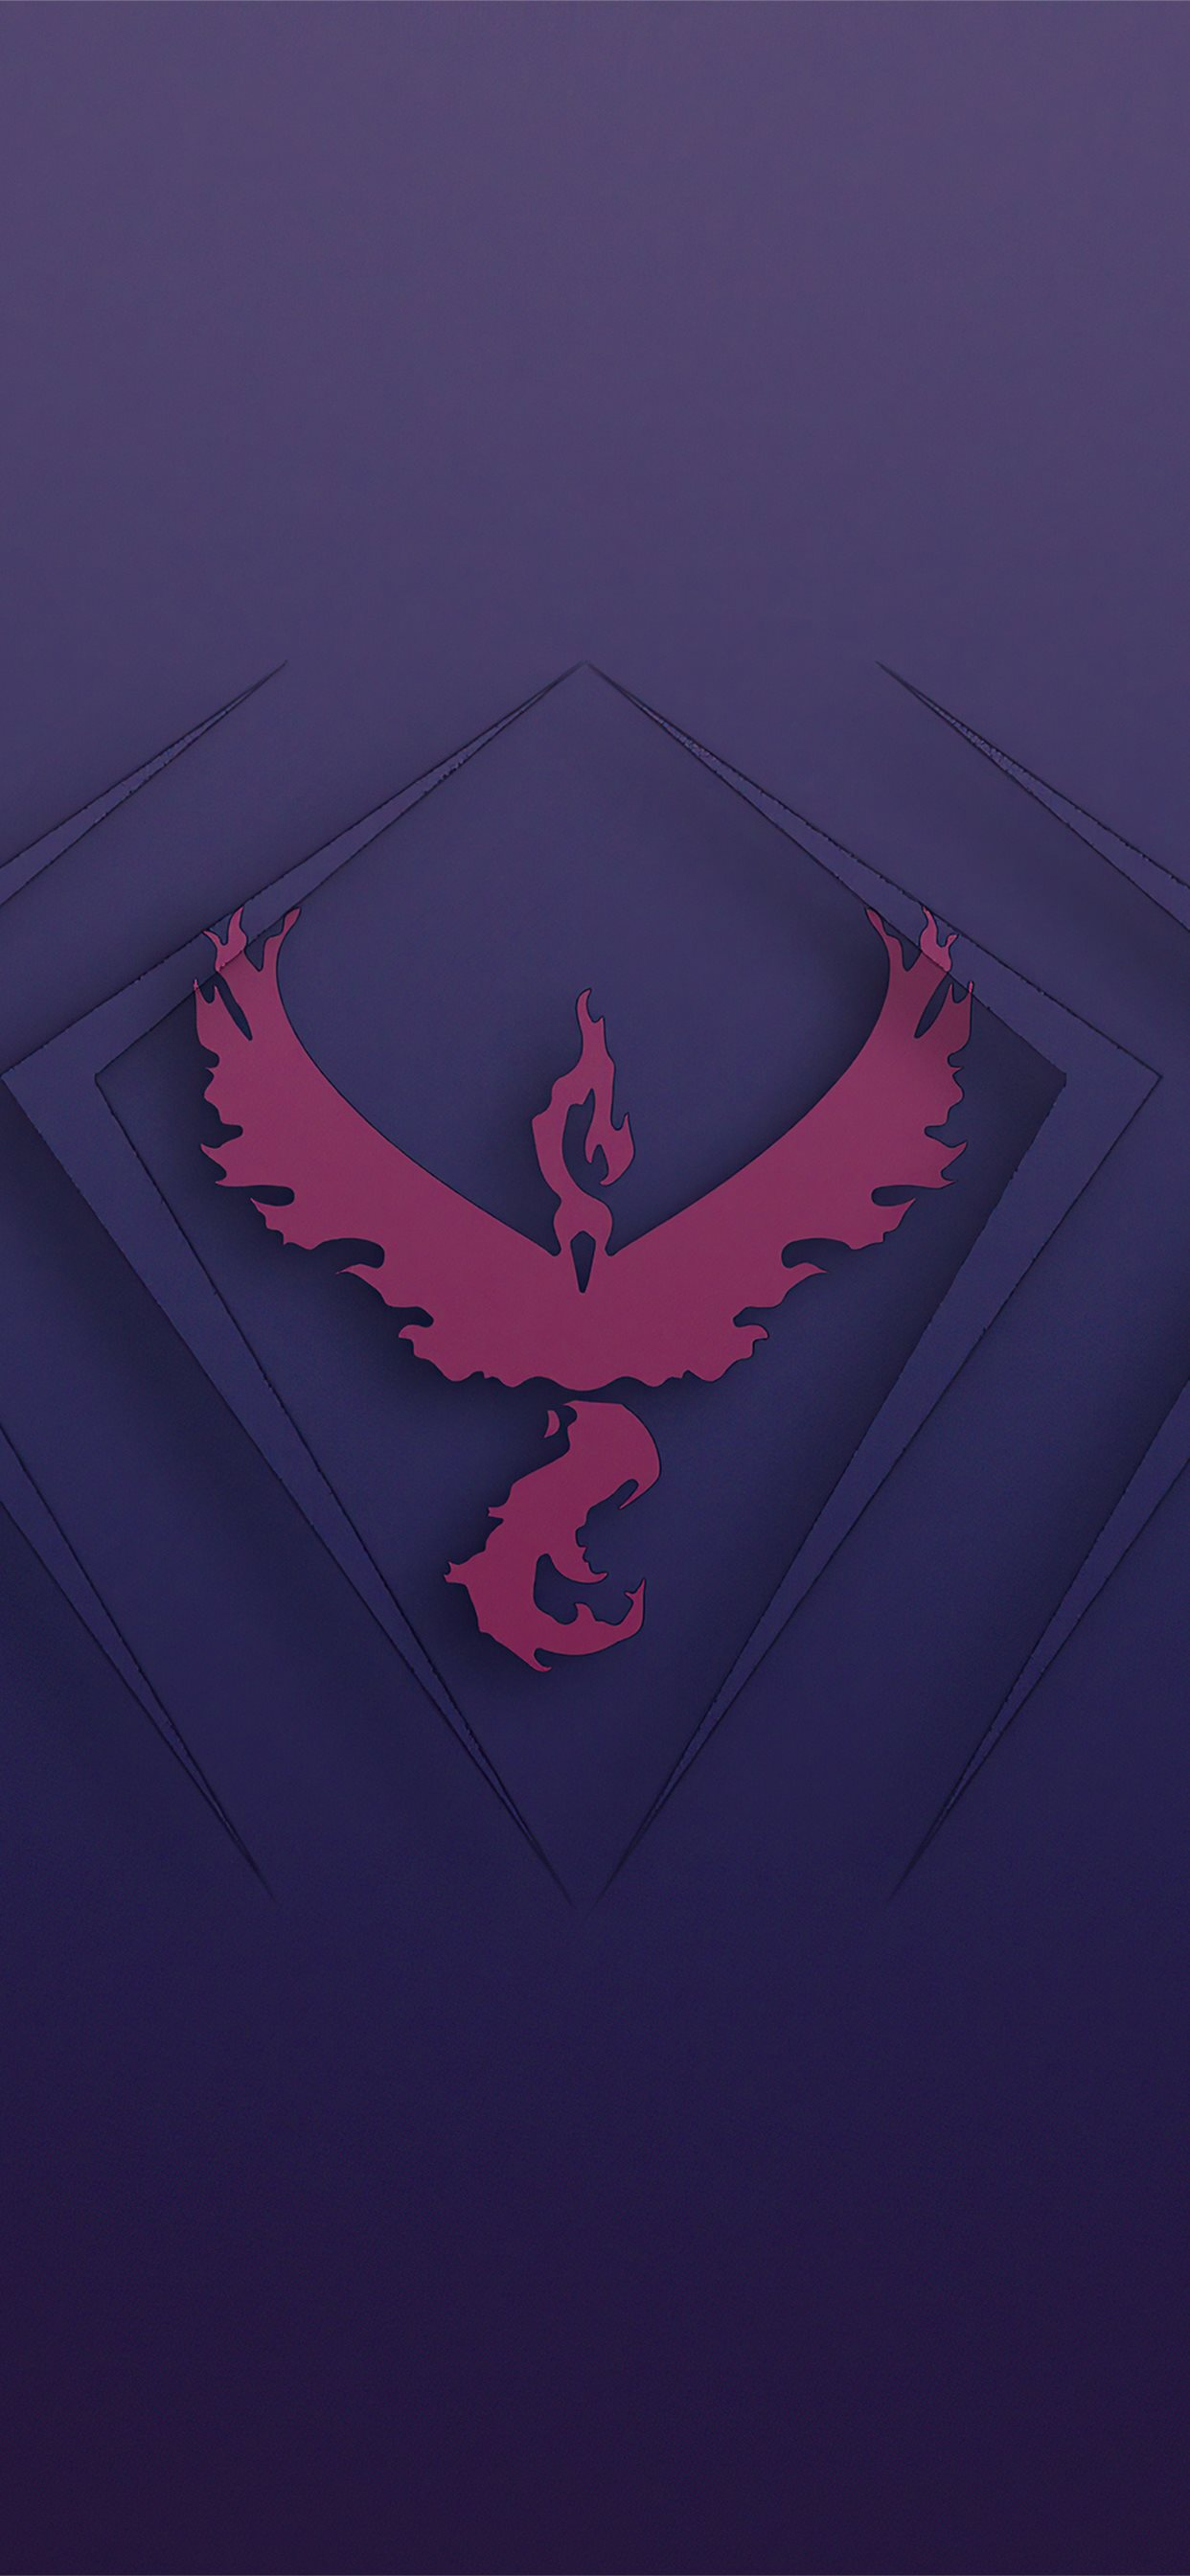 Phoenix Pokemon Logo 4k Iphone 11 Wallpapers Free Download